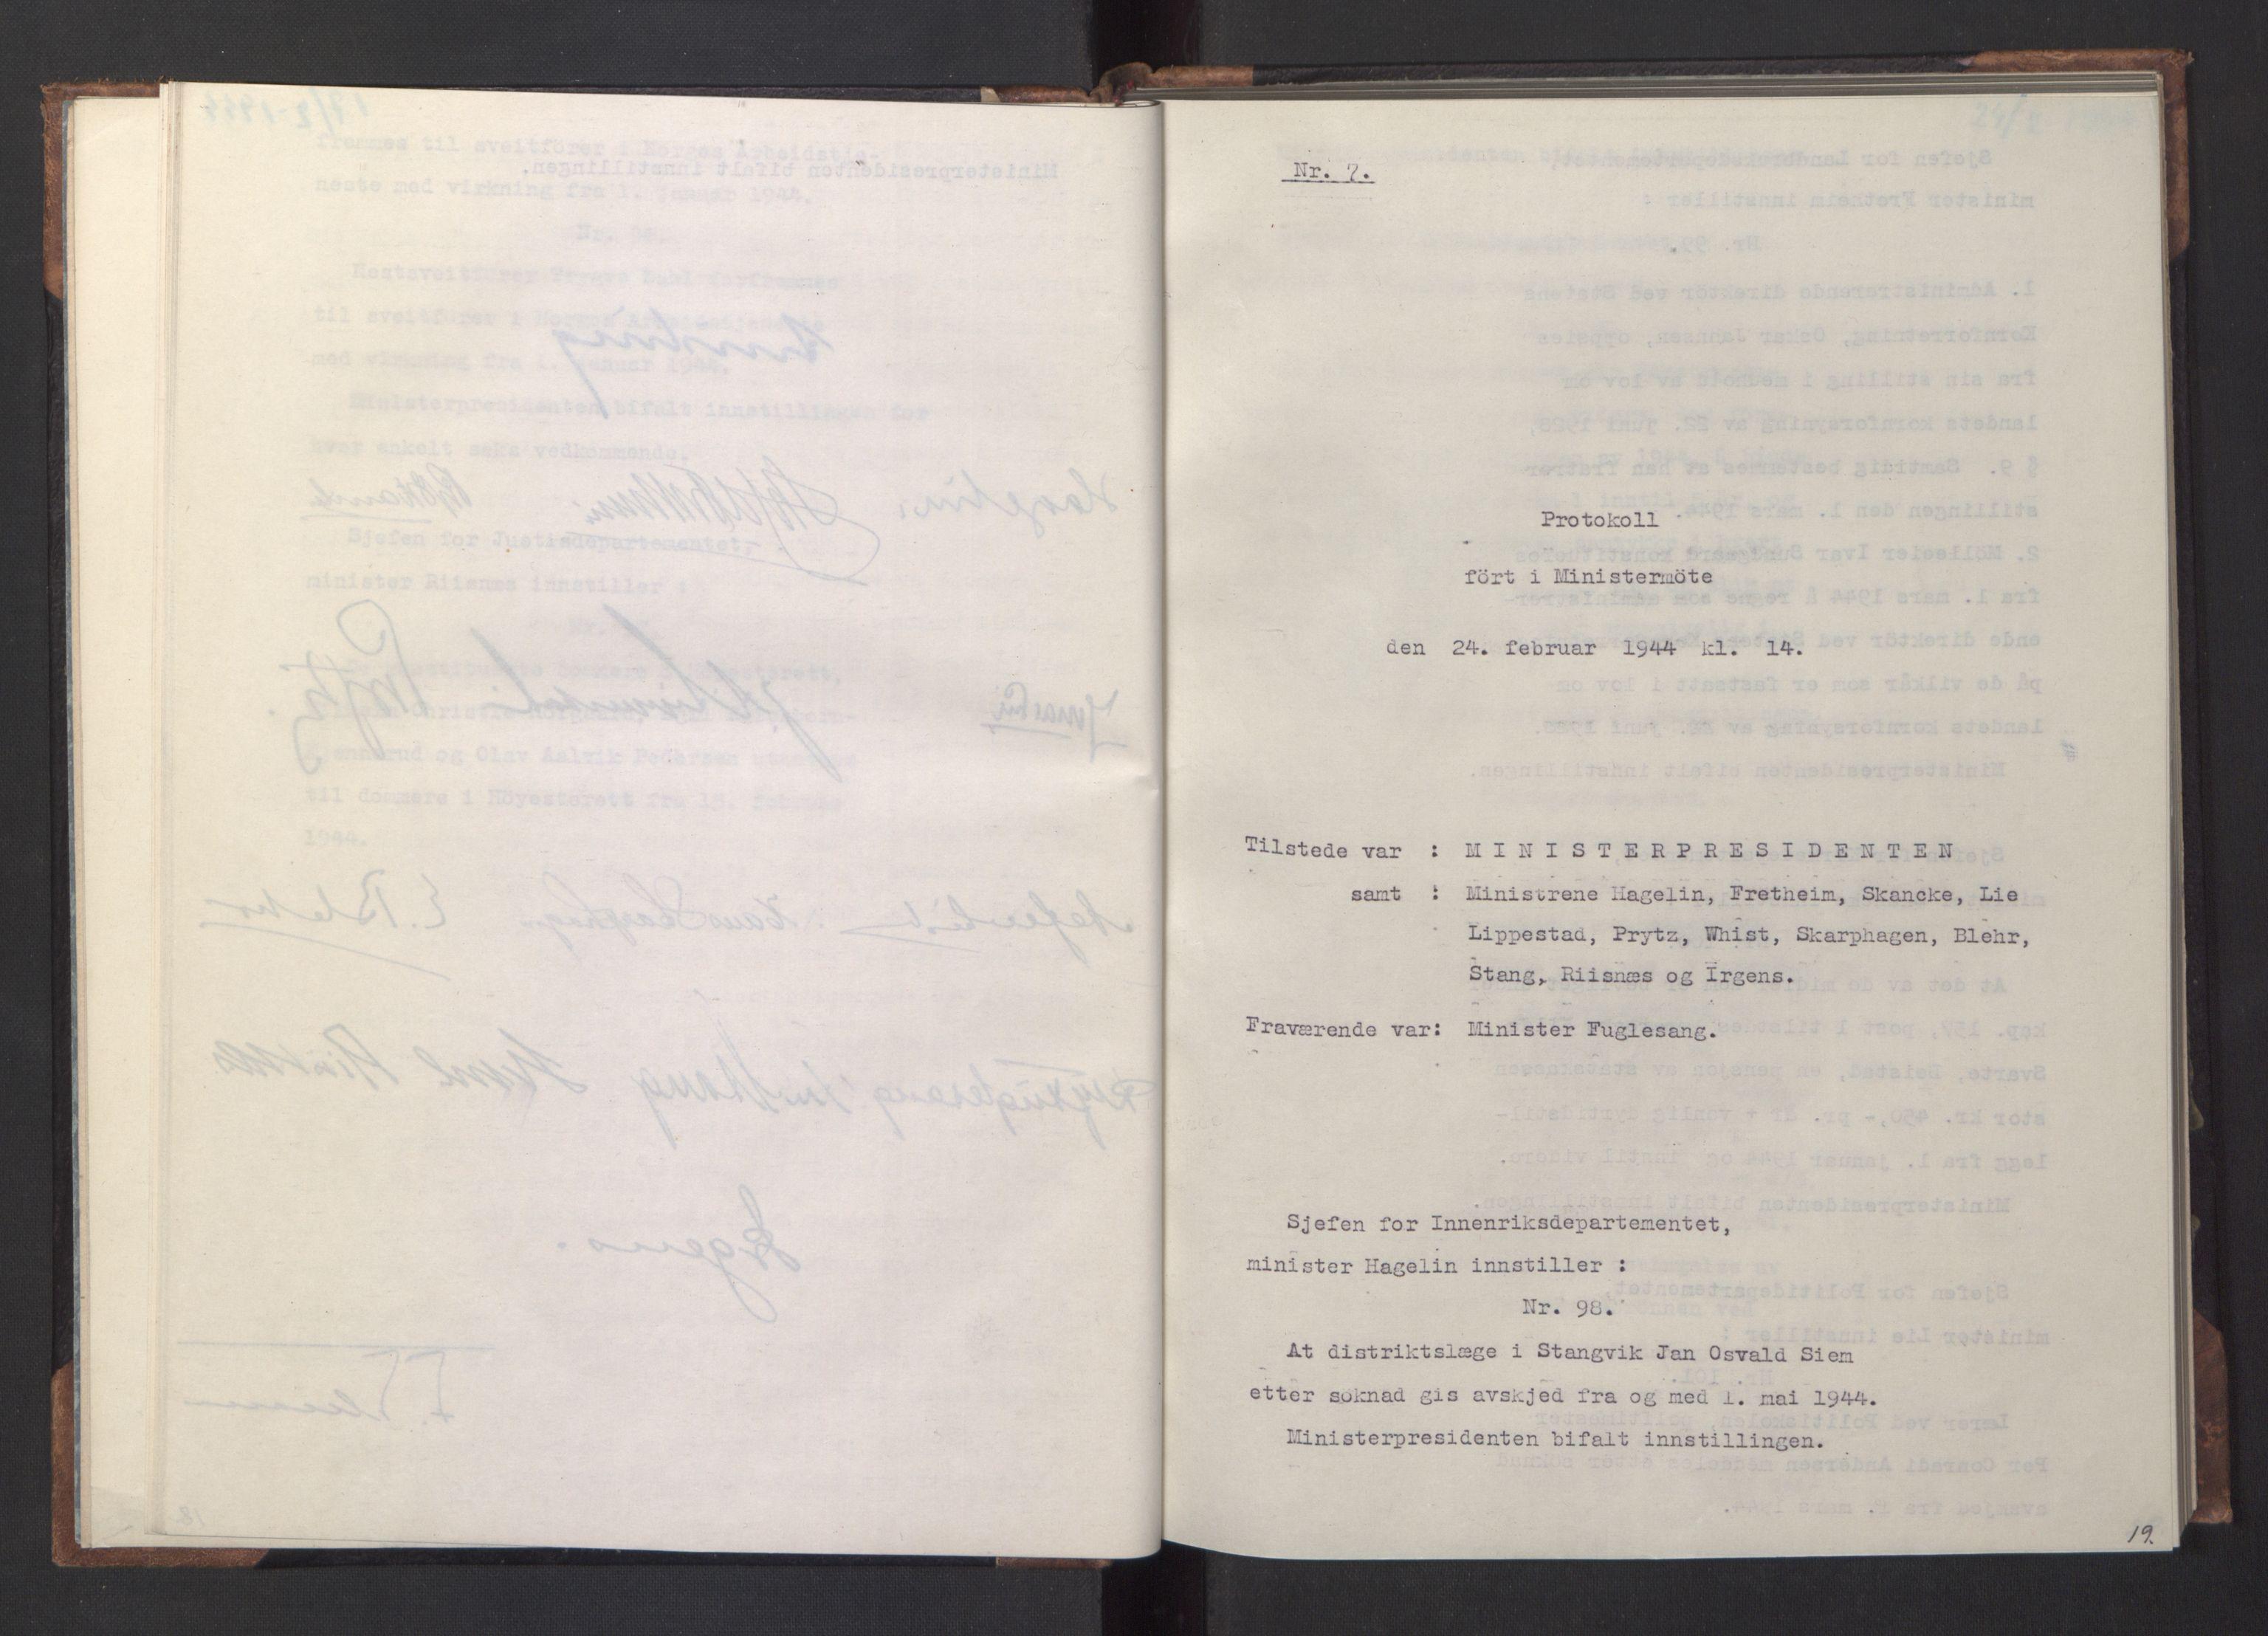 RA, NS-administrasjonen 1940-1945 (Statsrådsekretariatet, de kommisariske statsråder mm), D/Da/L0005: Protokoll fra ministermøter, 1944, s. 18b-19a